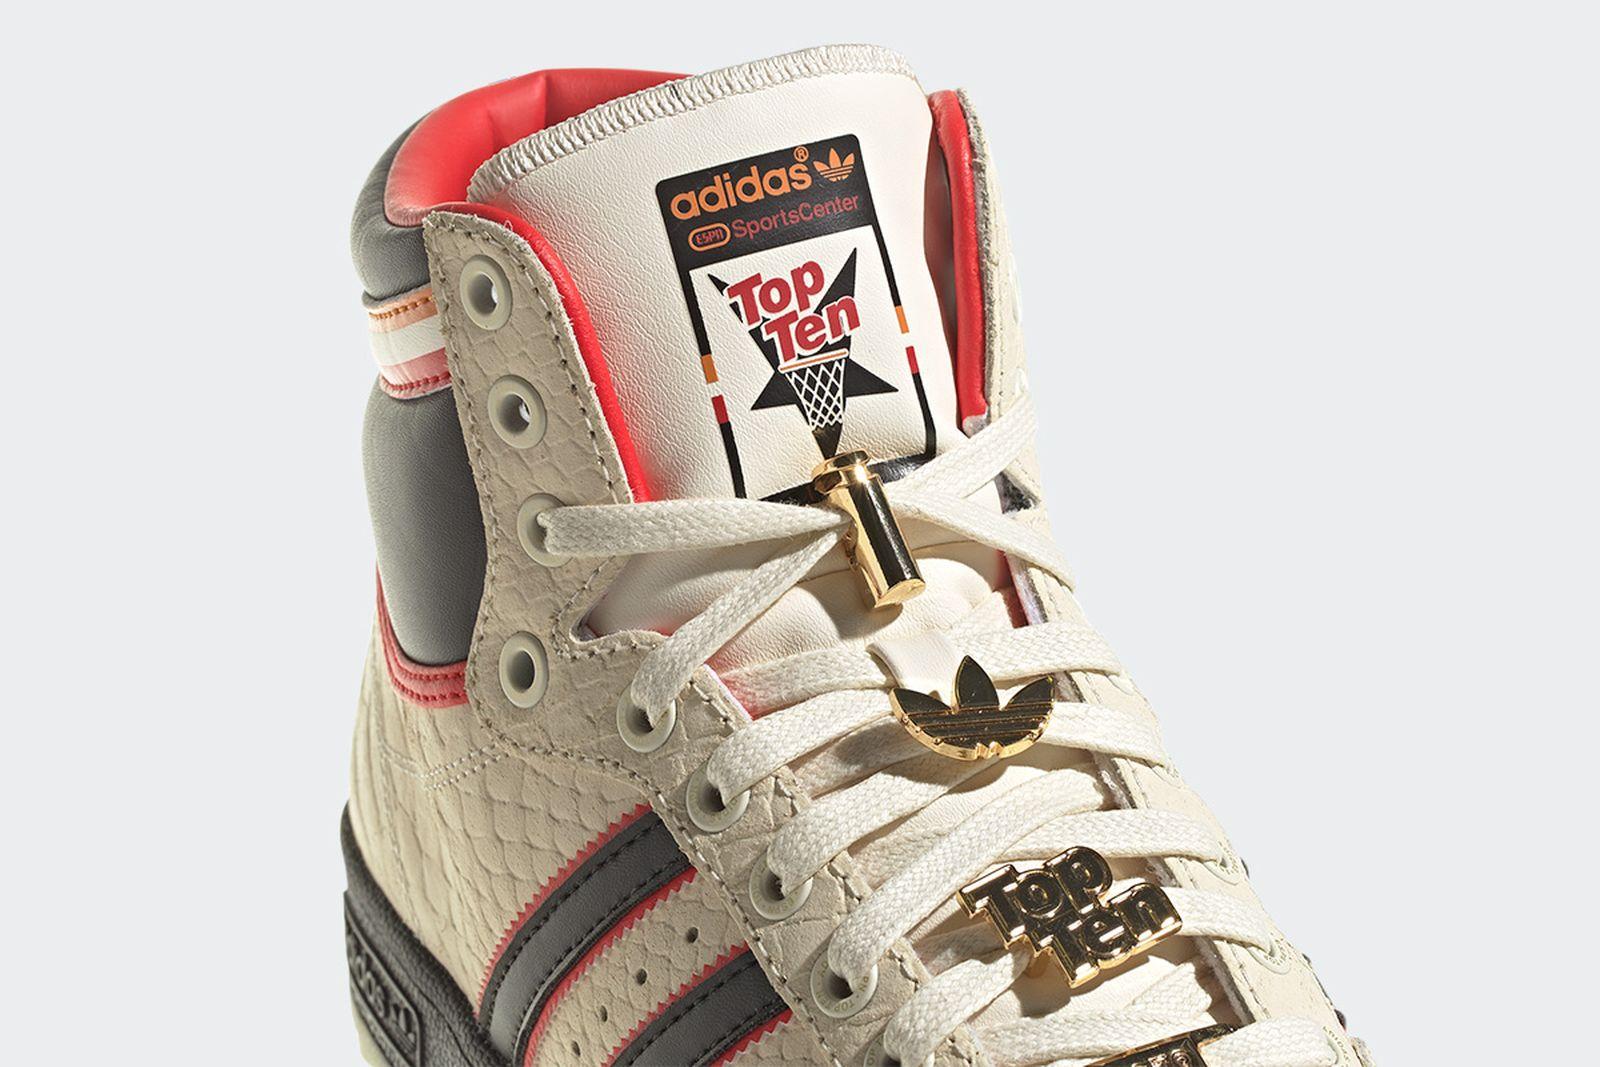 epsn-adidas-top-ten-hi-release-info-03